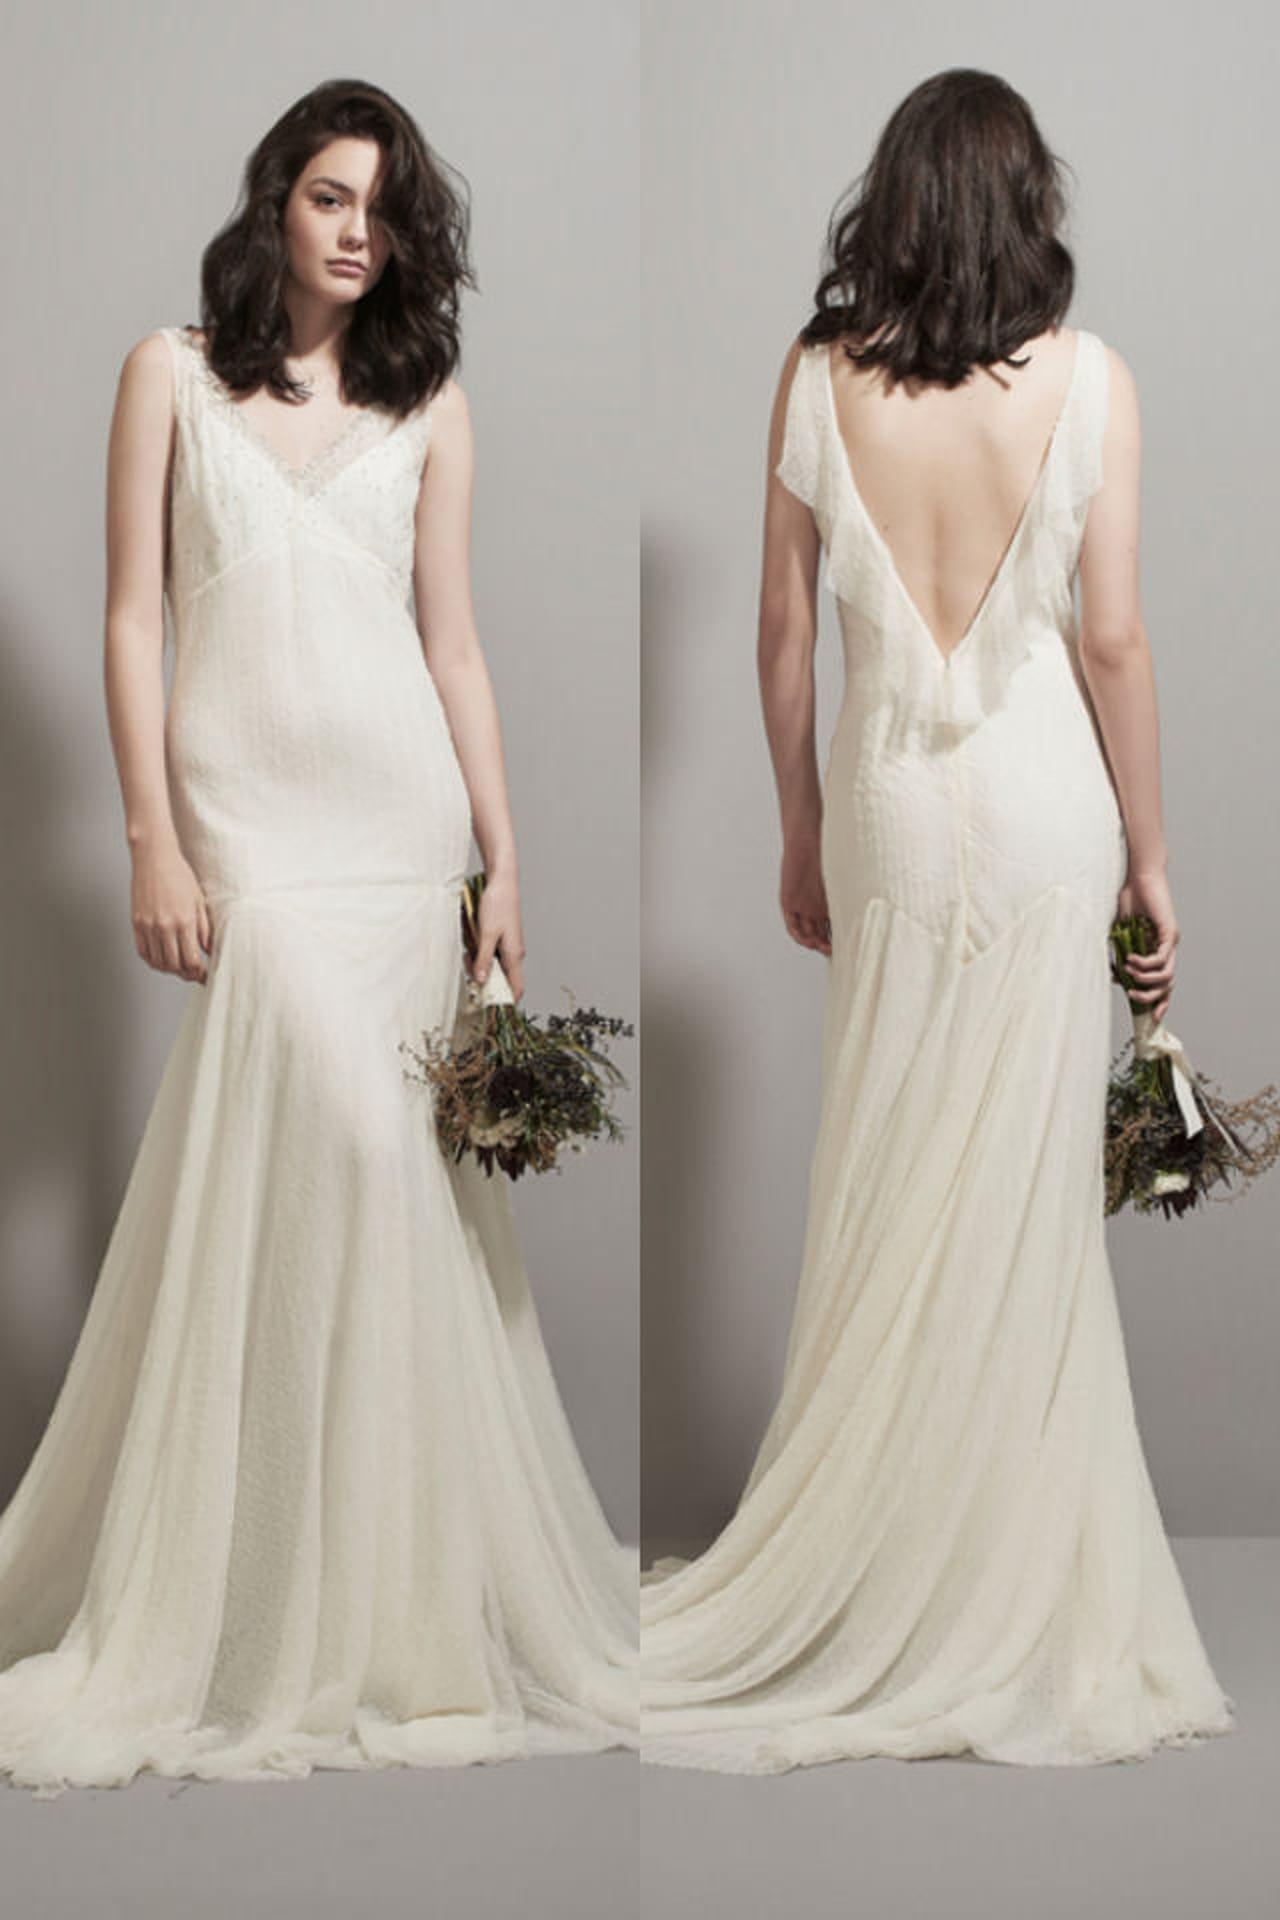 6d55c9b49 Vestidos de noiva simples para se inspirar